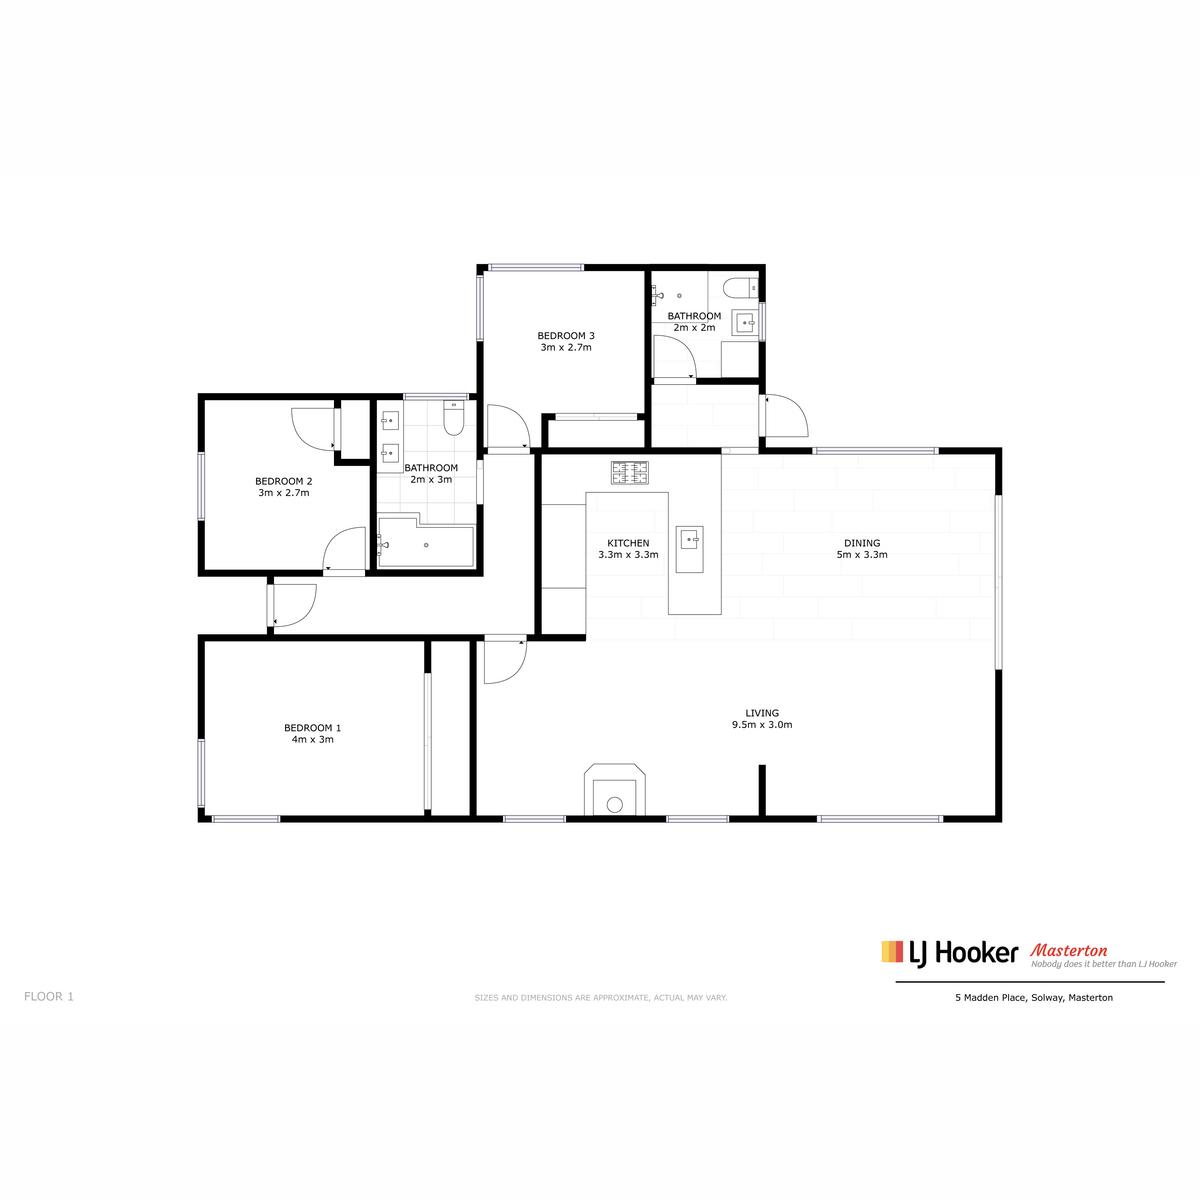 5 Madden Place Mastertonproperty floorplan image